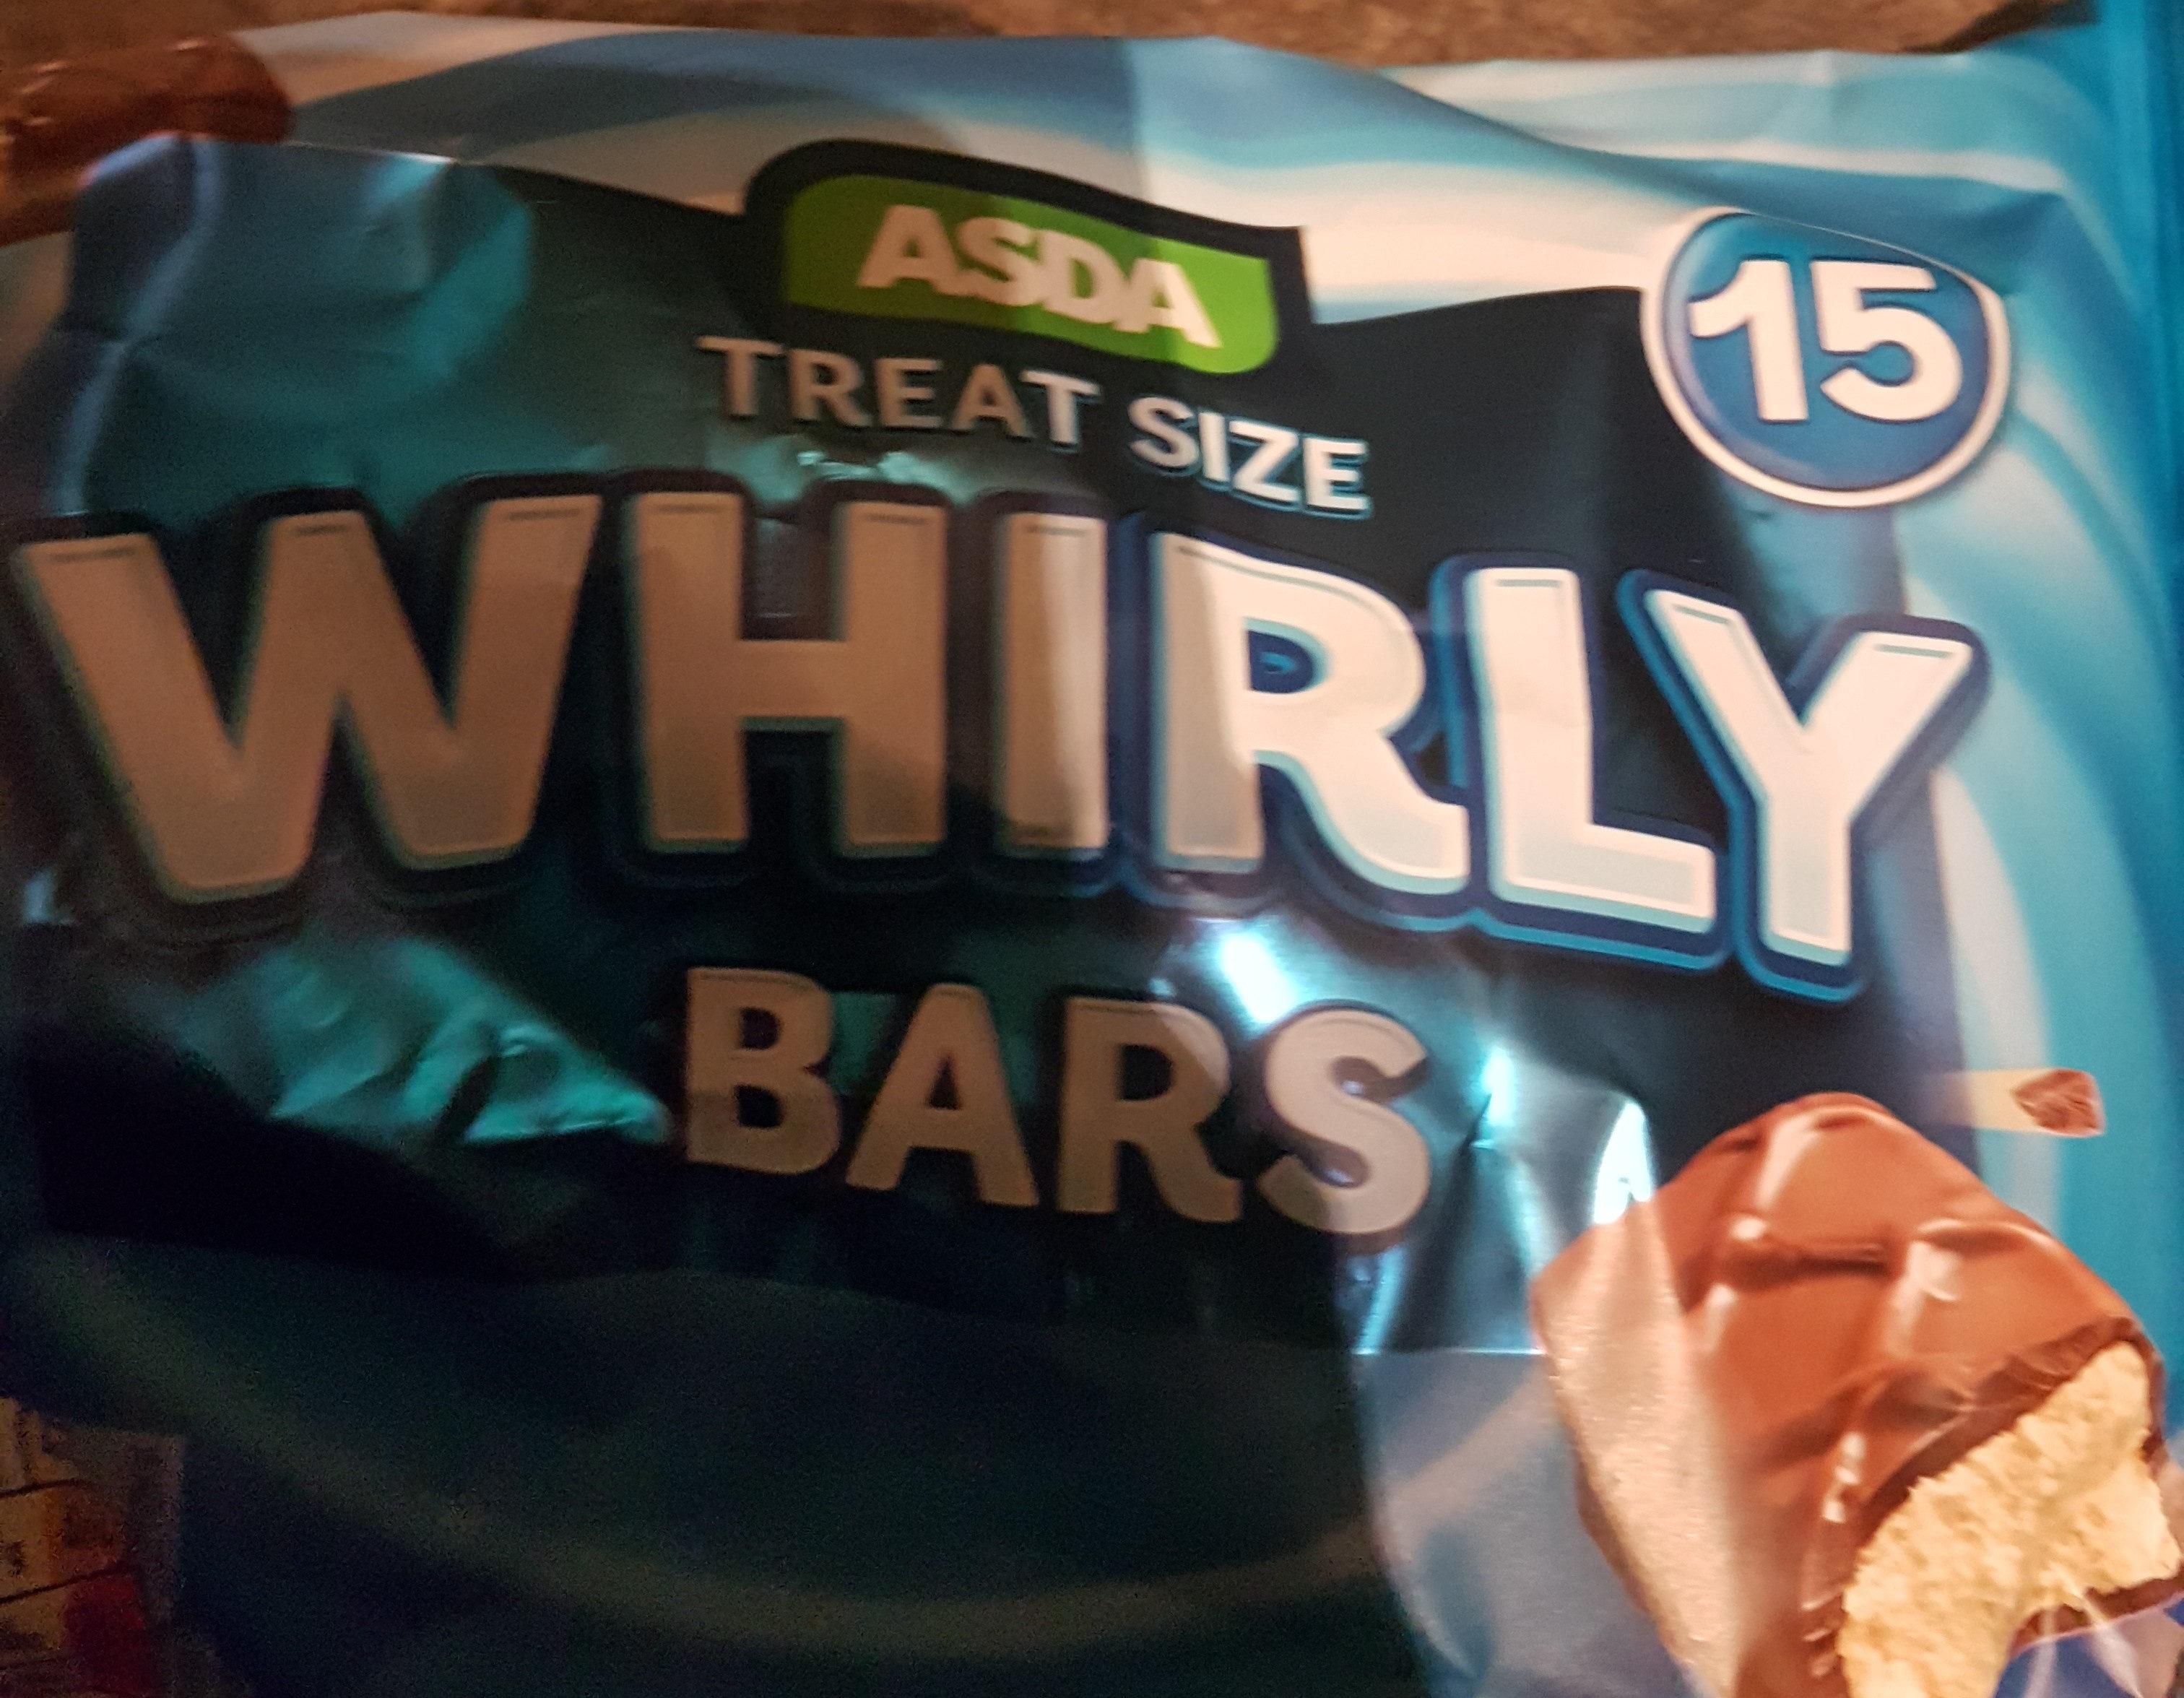 Whirly bars - Produit